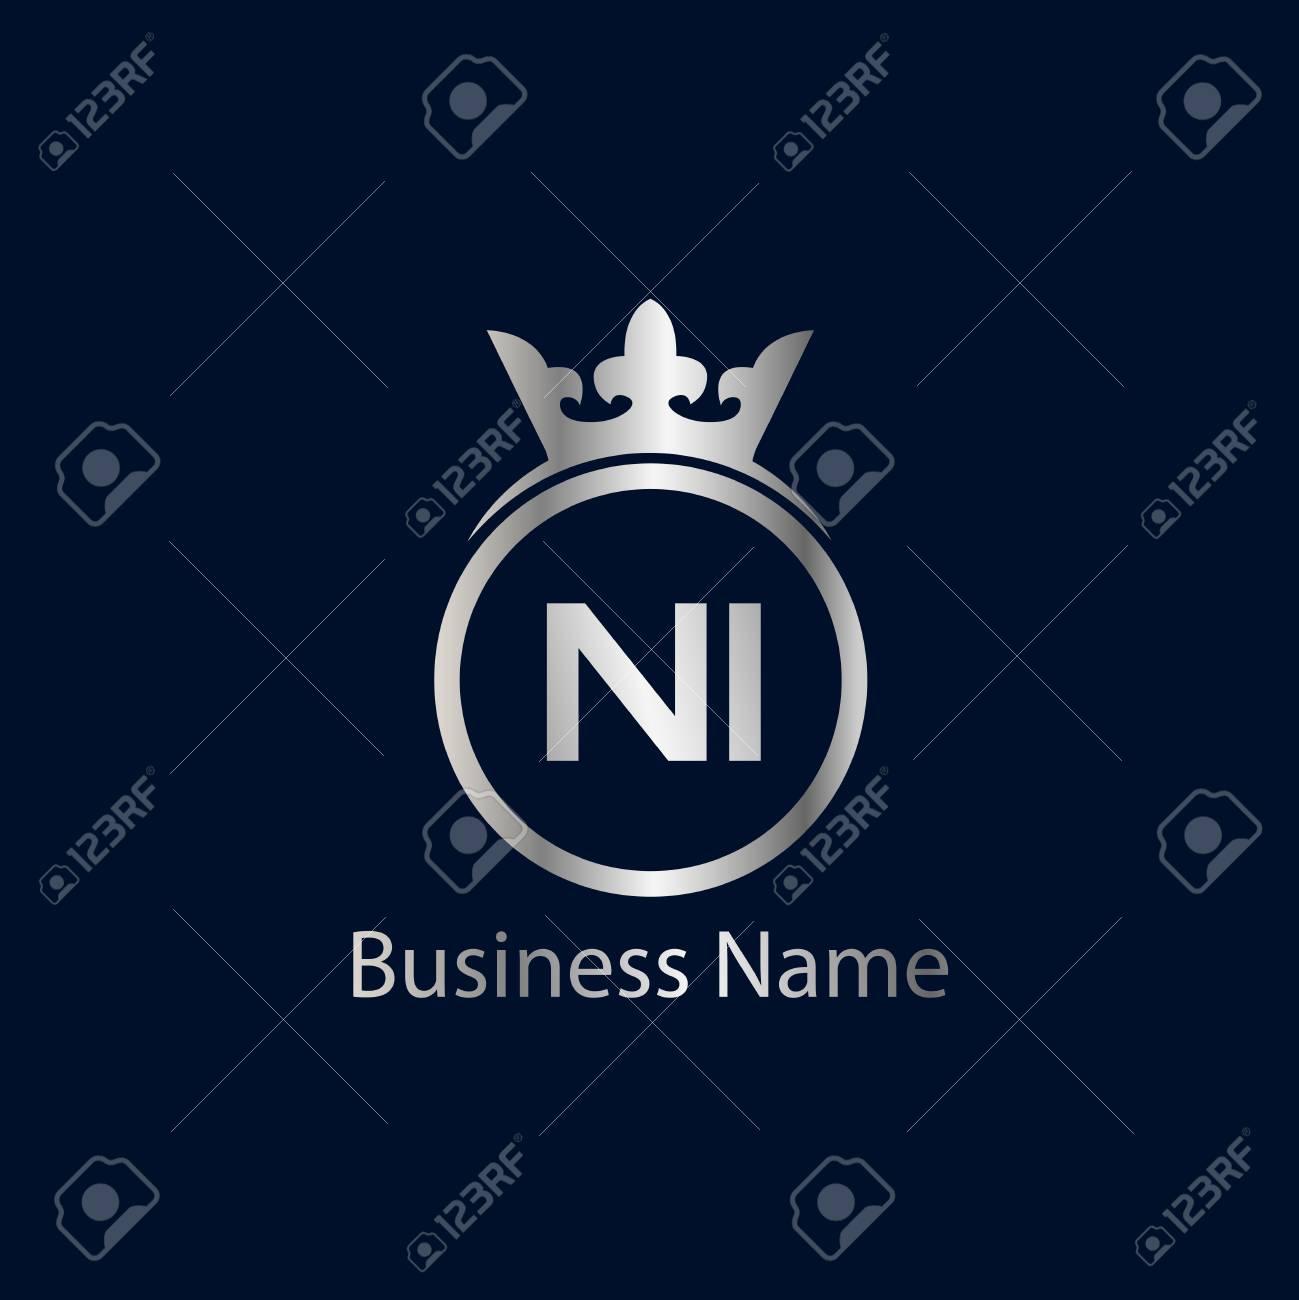 Initial Letter NI Logo Template Design - 109604930